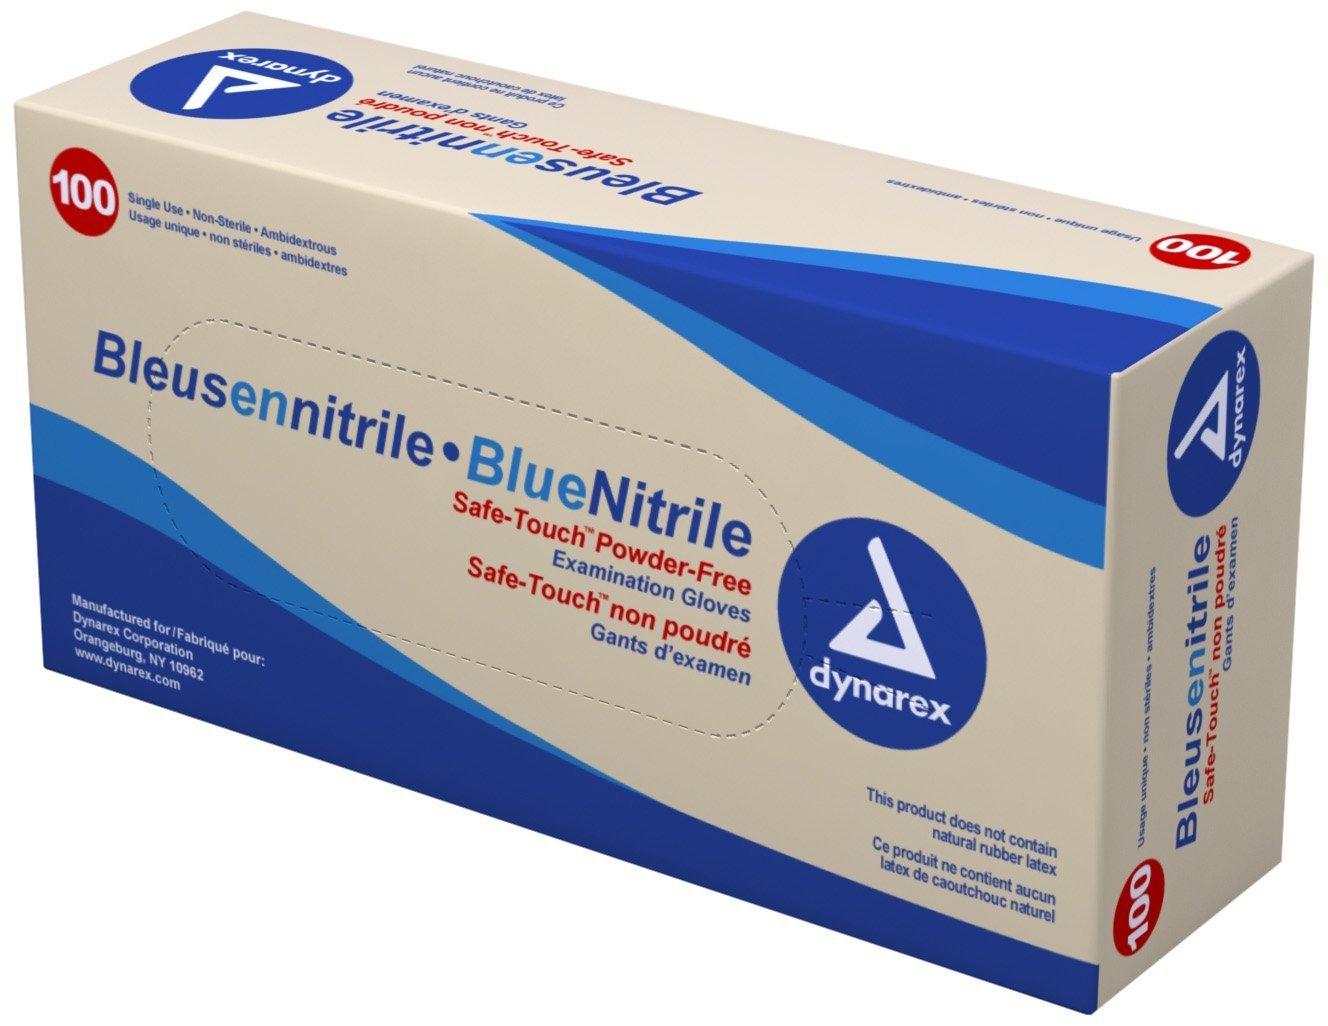 Dynarex 2512 Nitrile Exam Glove (Non-Latex) Powder Free Size, Medium, Blue 100/bx 10bx/cs